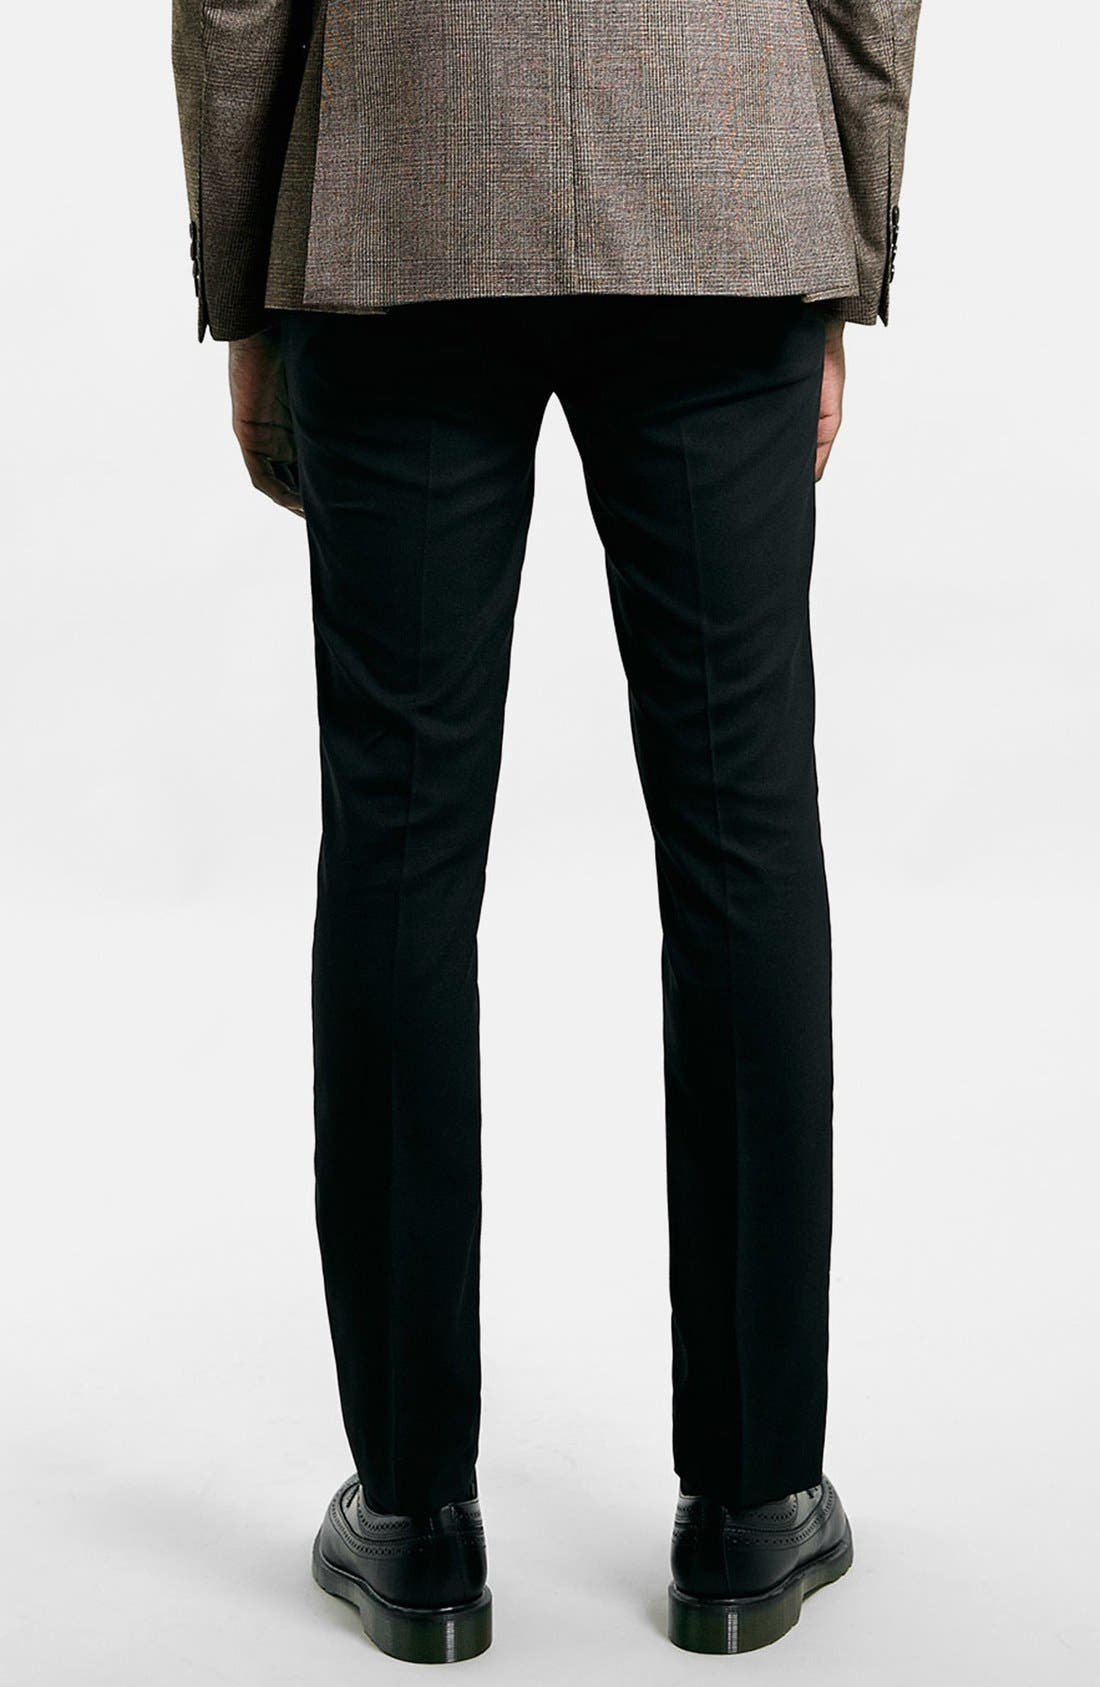 Ultra Skinny Black Suit Trousers,                             Alternate thumbnail 4, color,                             001